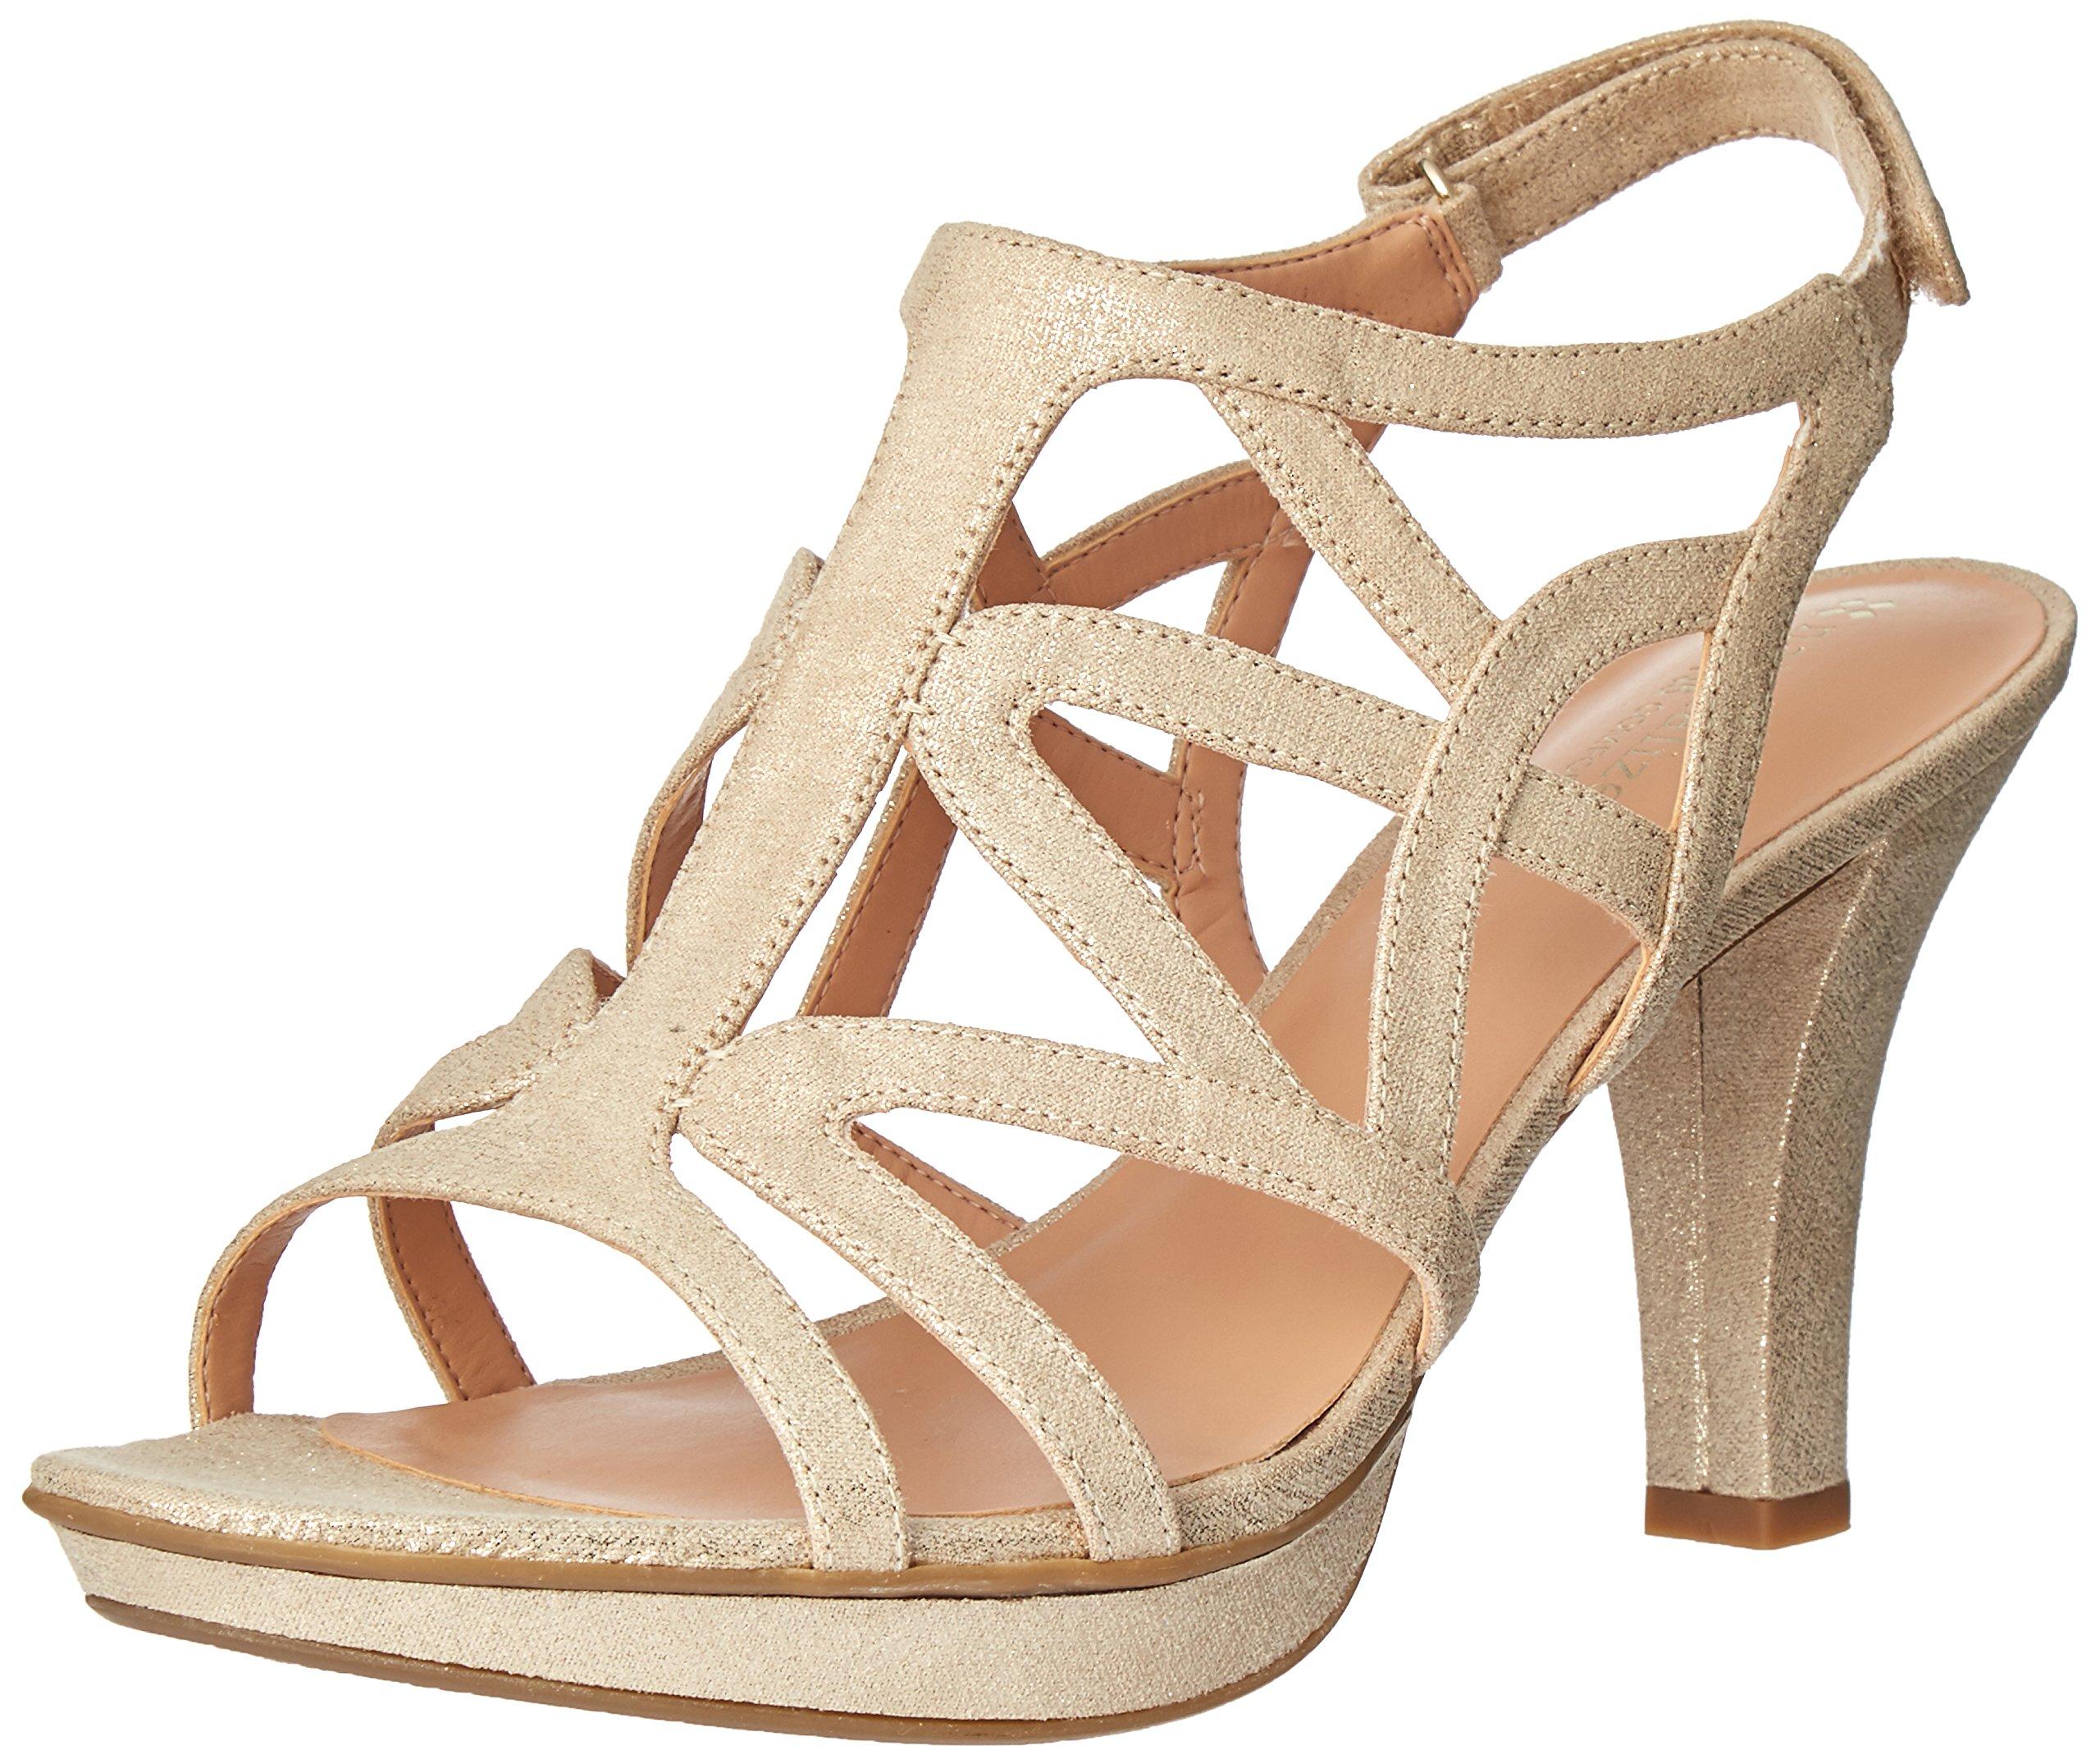 Naturalizer Women's Danya Platform Dress Sandal, Taupe/Gold, 8.5 M US